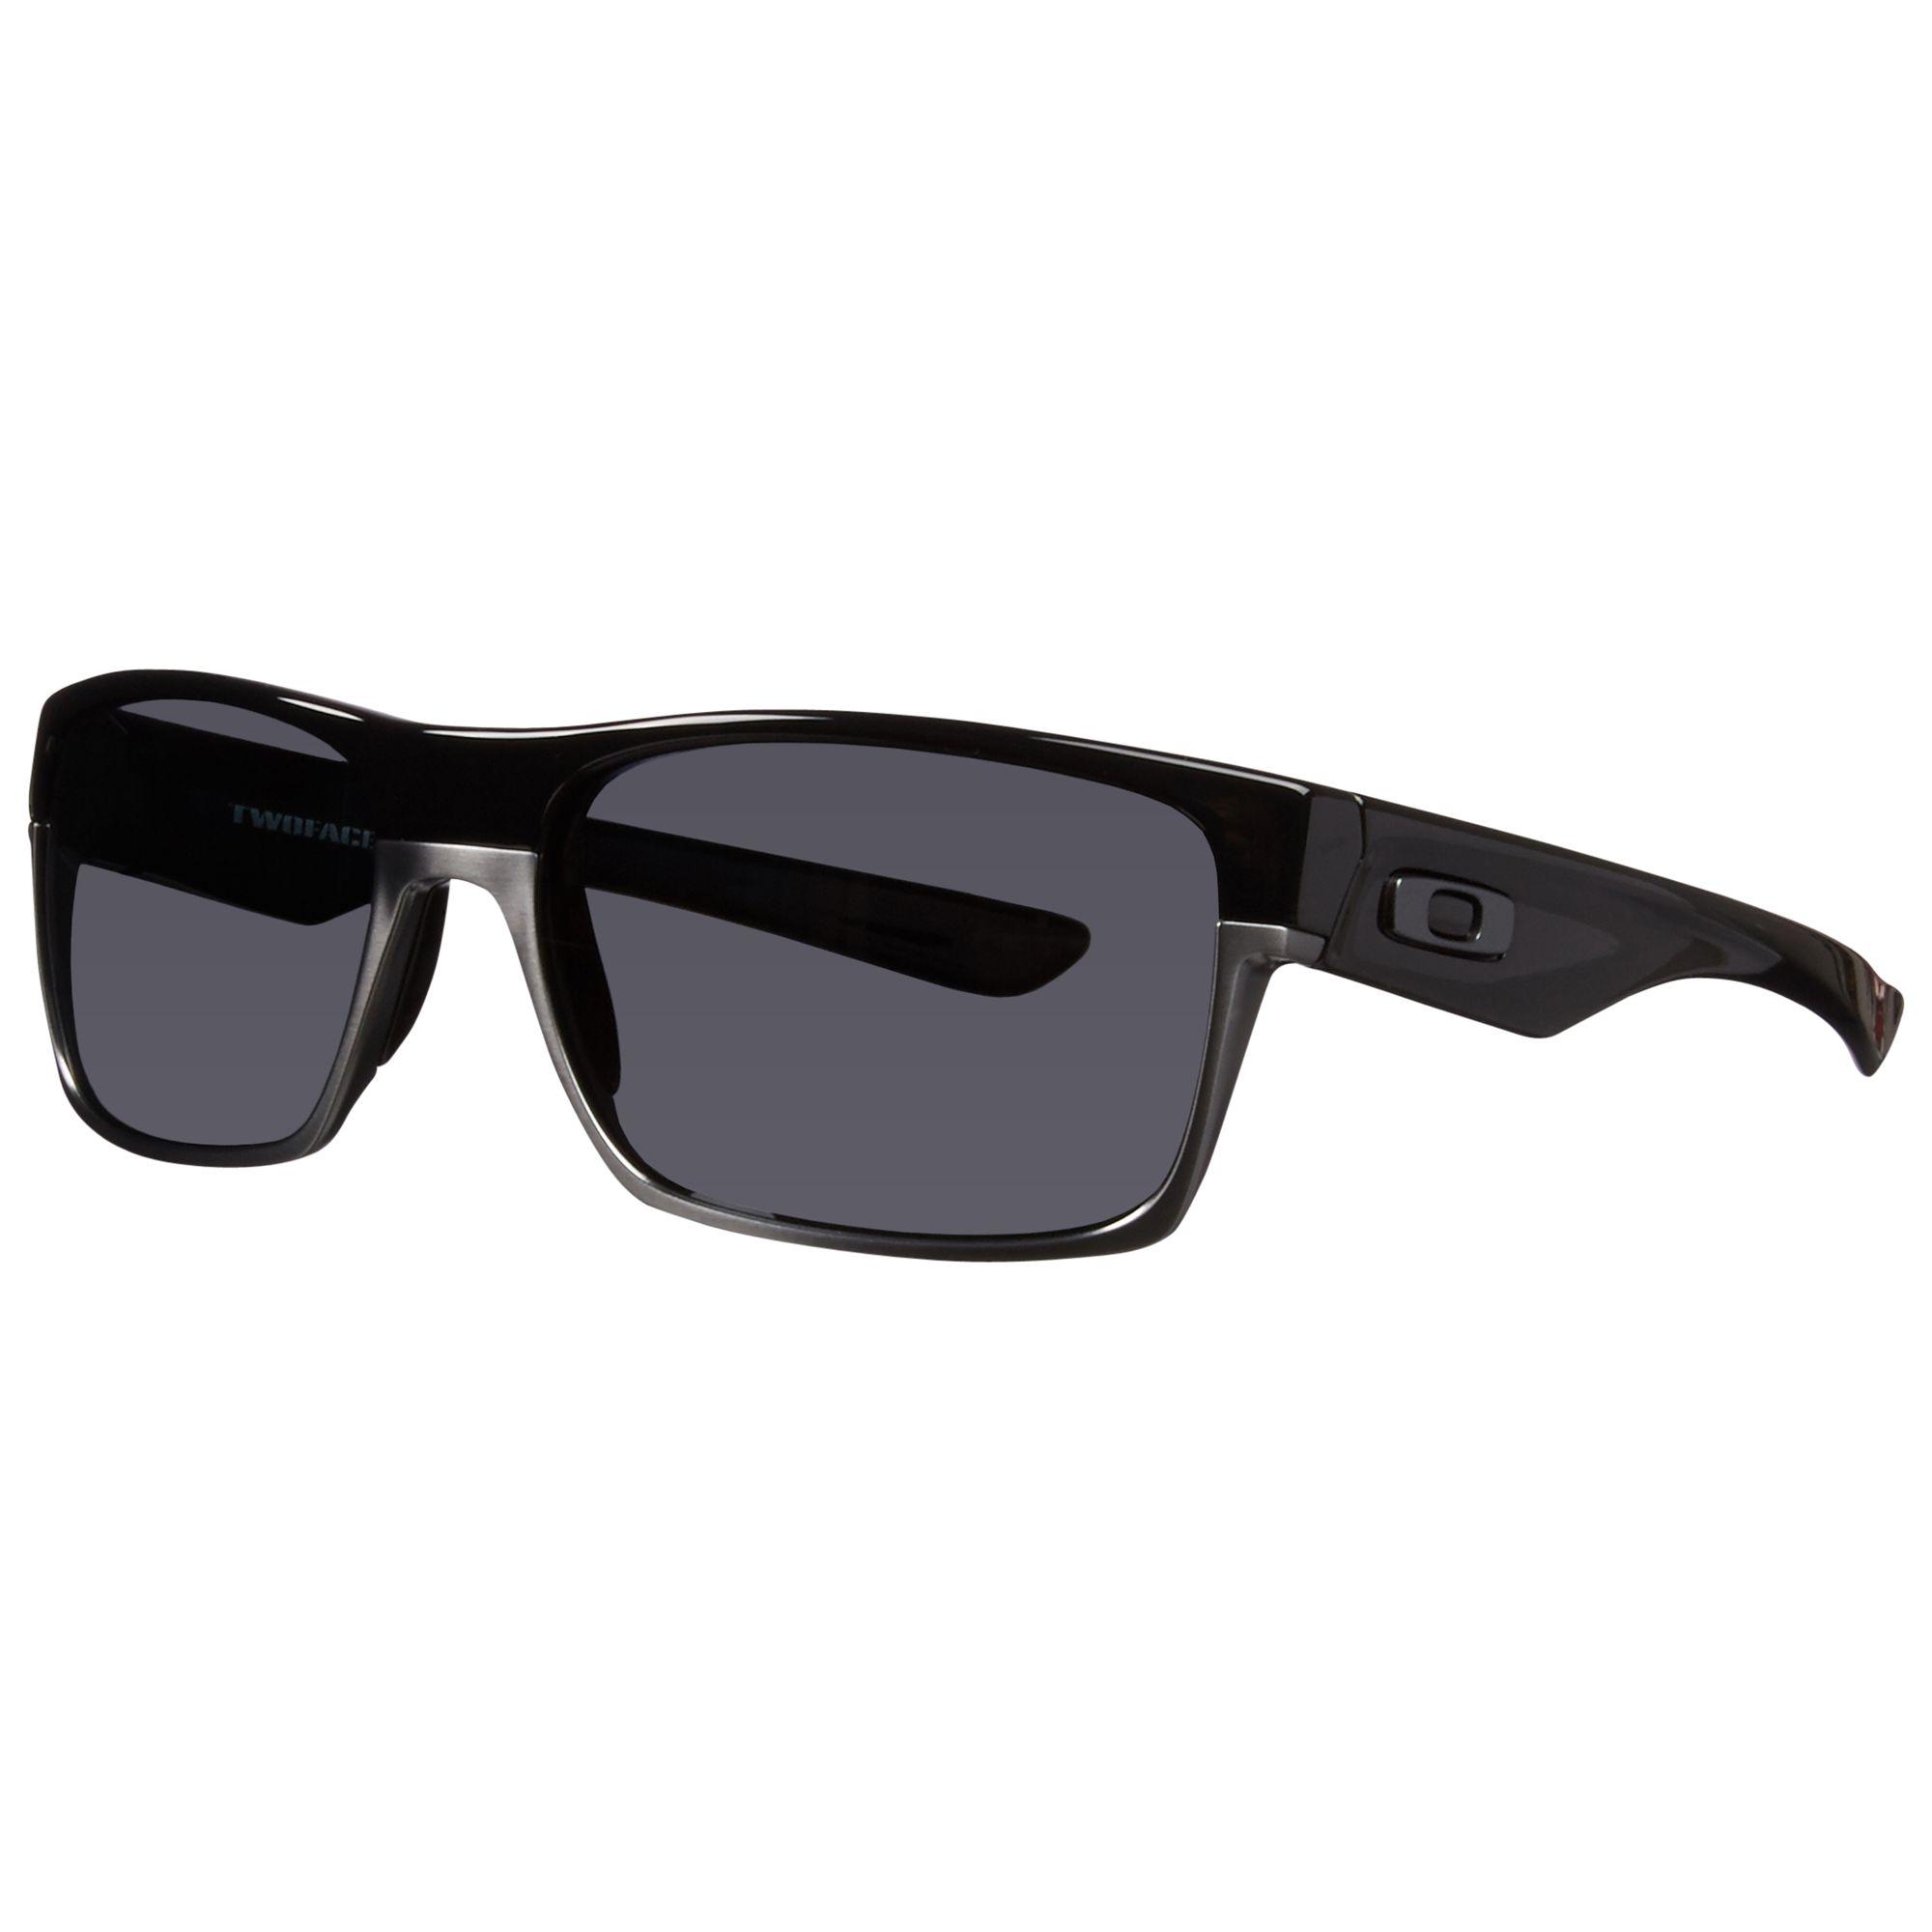 c33f3e2717 Oakley 009189 Polarised Twoface™ Rectangular Frame Acetate Sunglasses